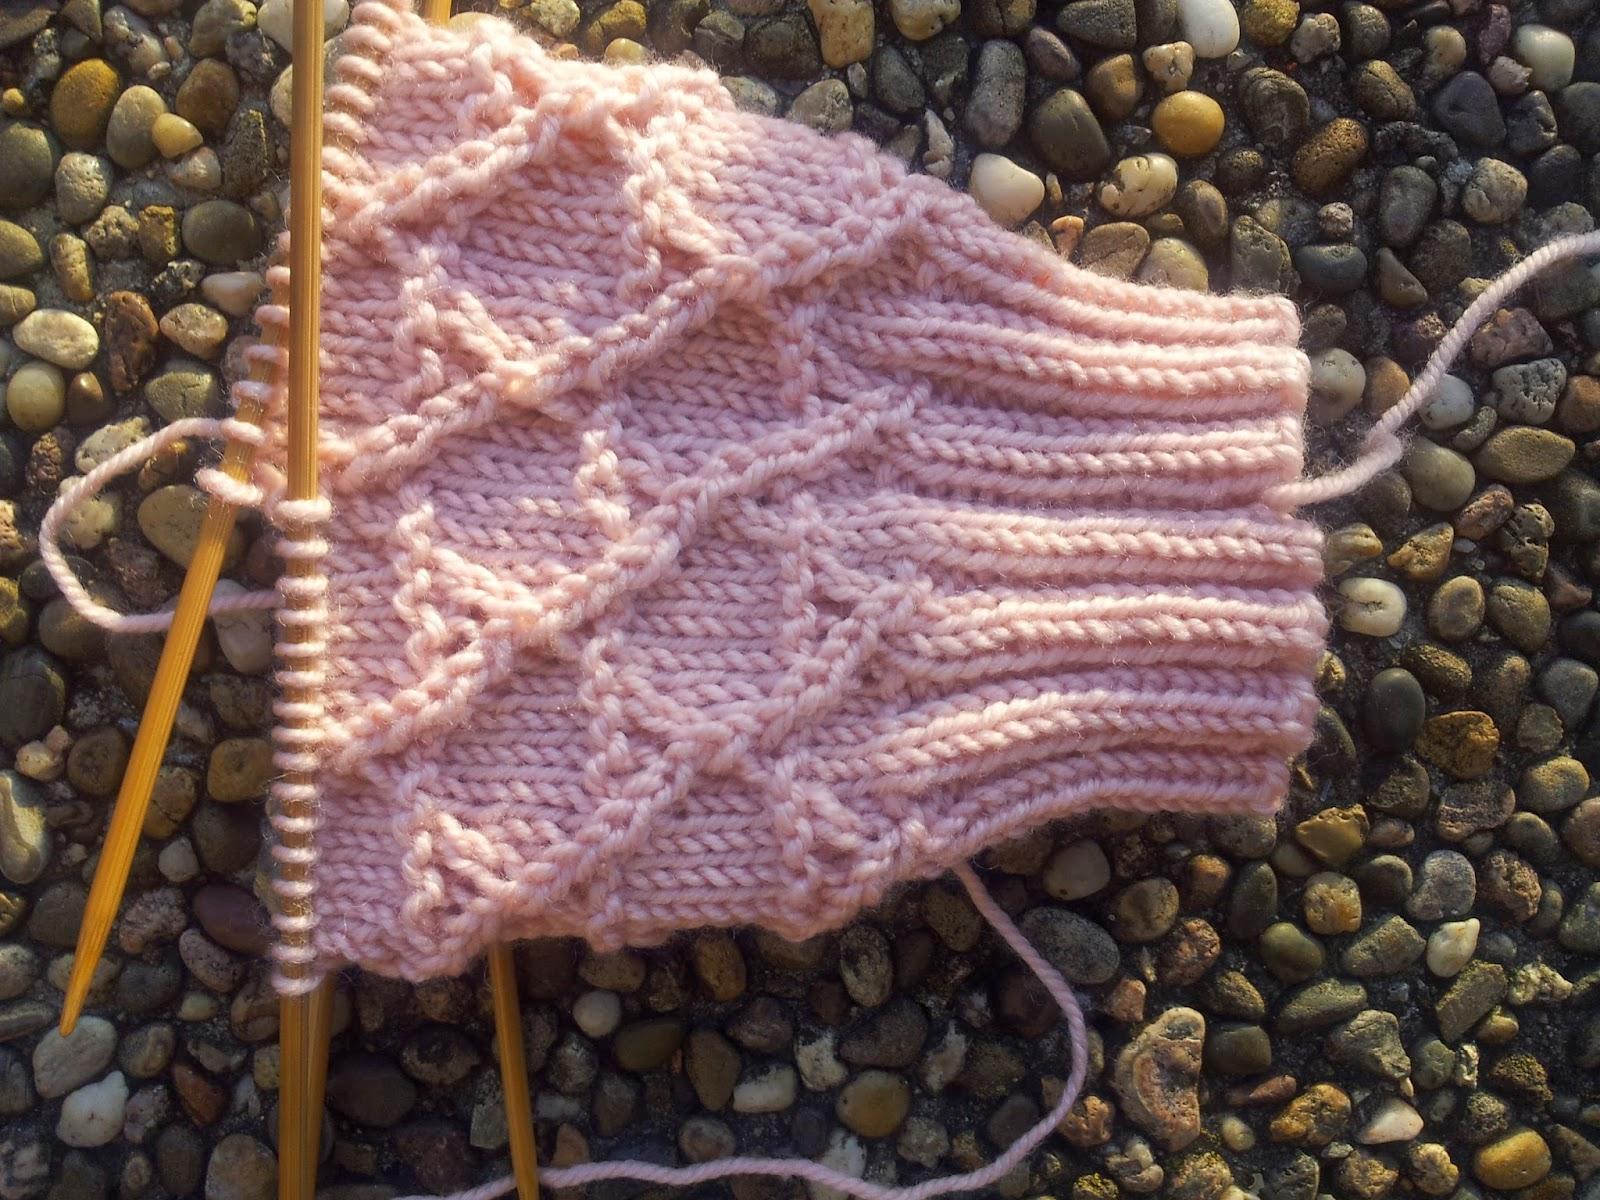 muster aus dem buch knitting nature von norah gaughan fr socken umzurechnen das ist mir auch ganz gut gelungen das erste muster stellt den - Muster Fur Socken